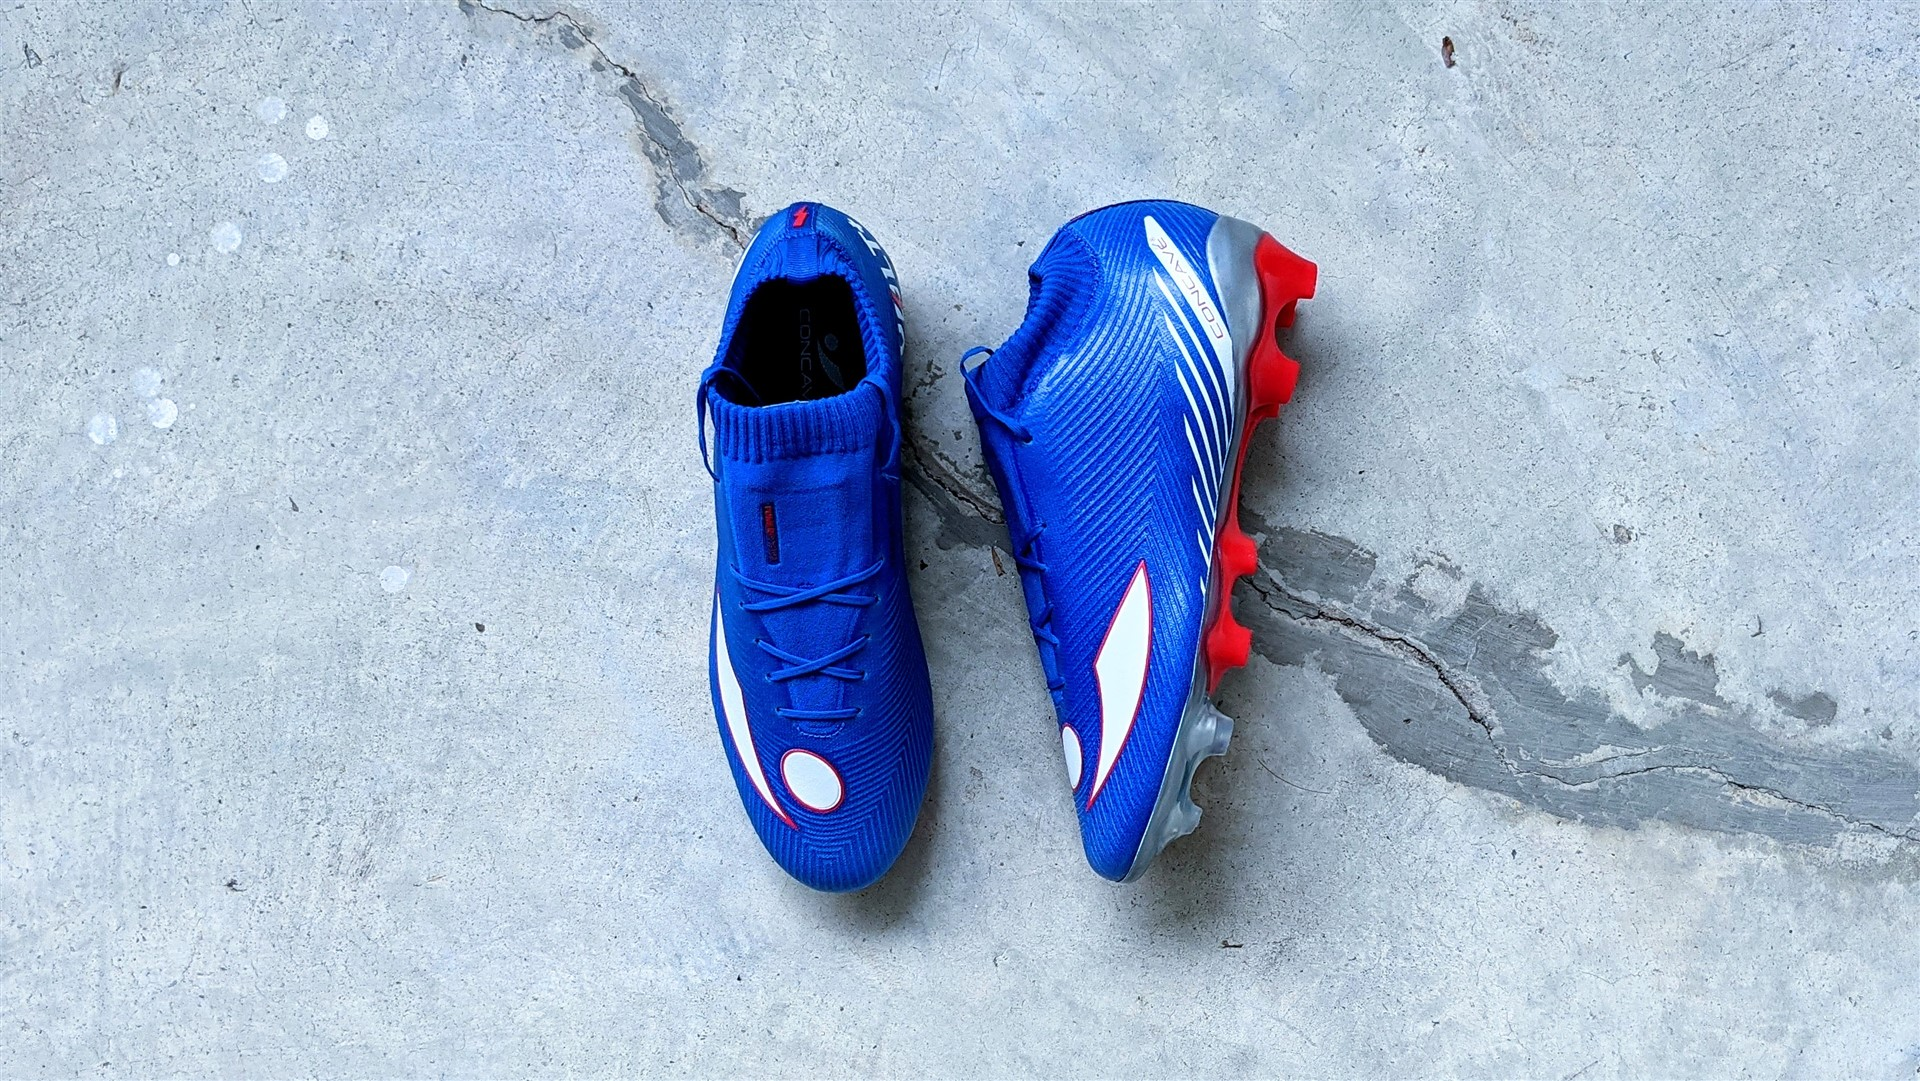 Concave Volt + football boots soccer cleats